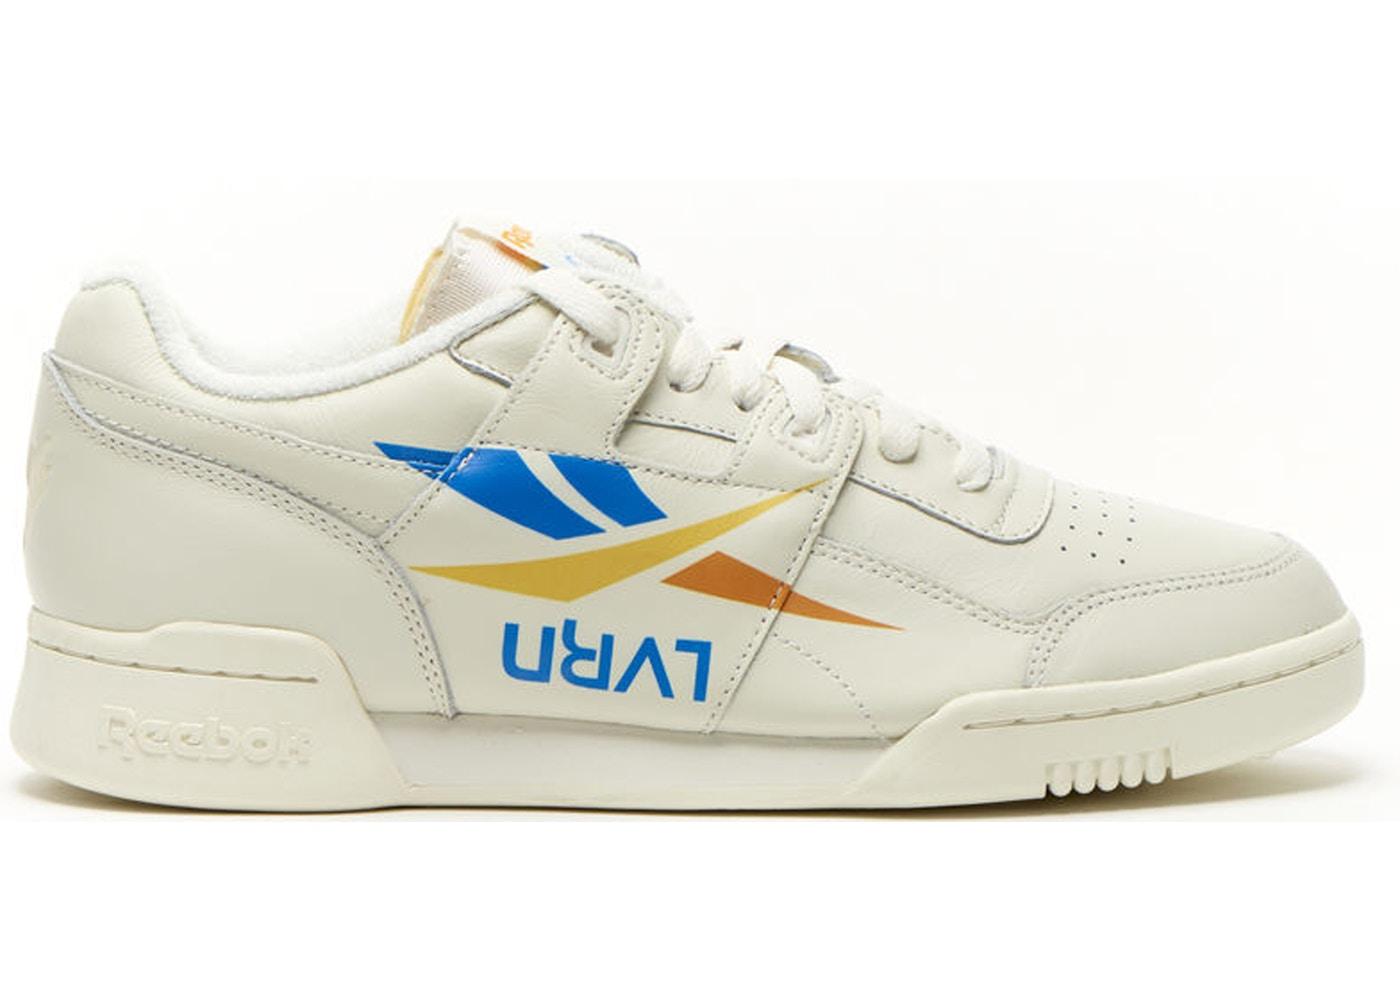 1669584c087 Reebok Size 17 Shoes - Release Date